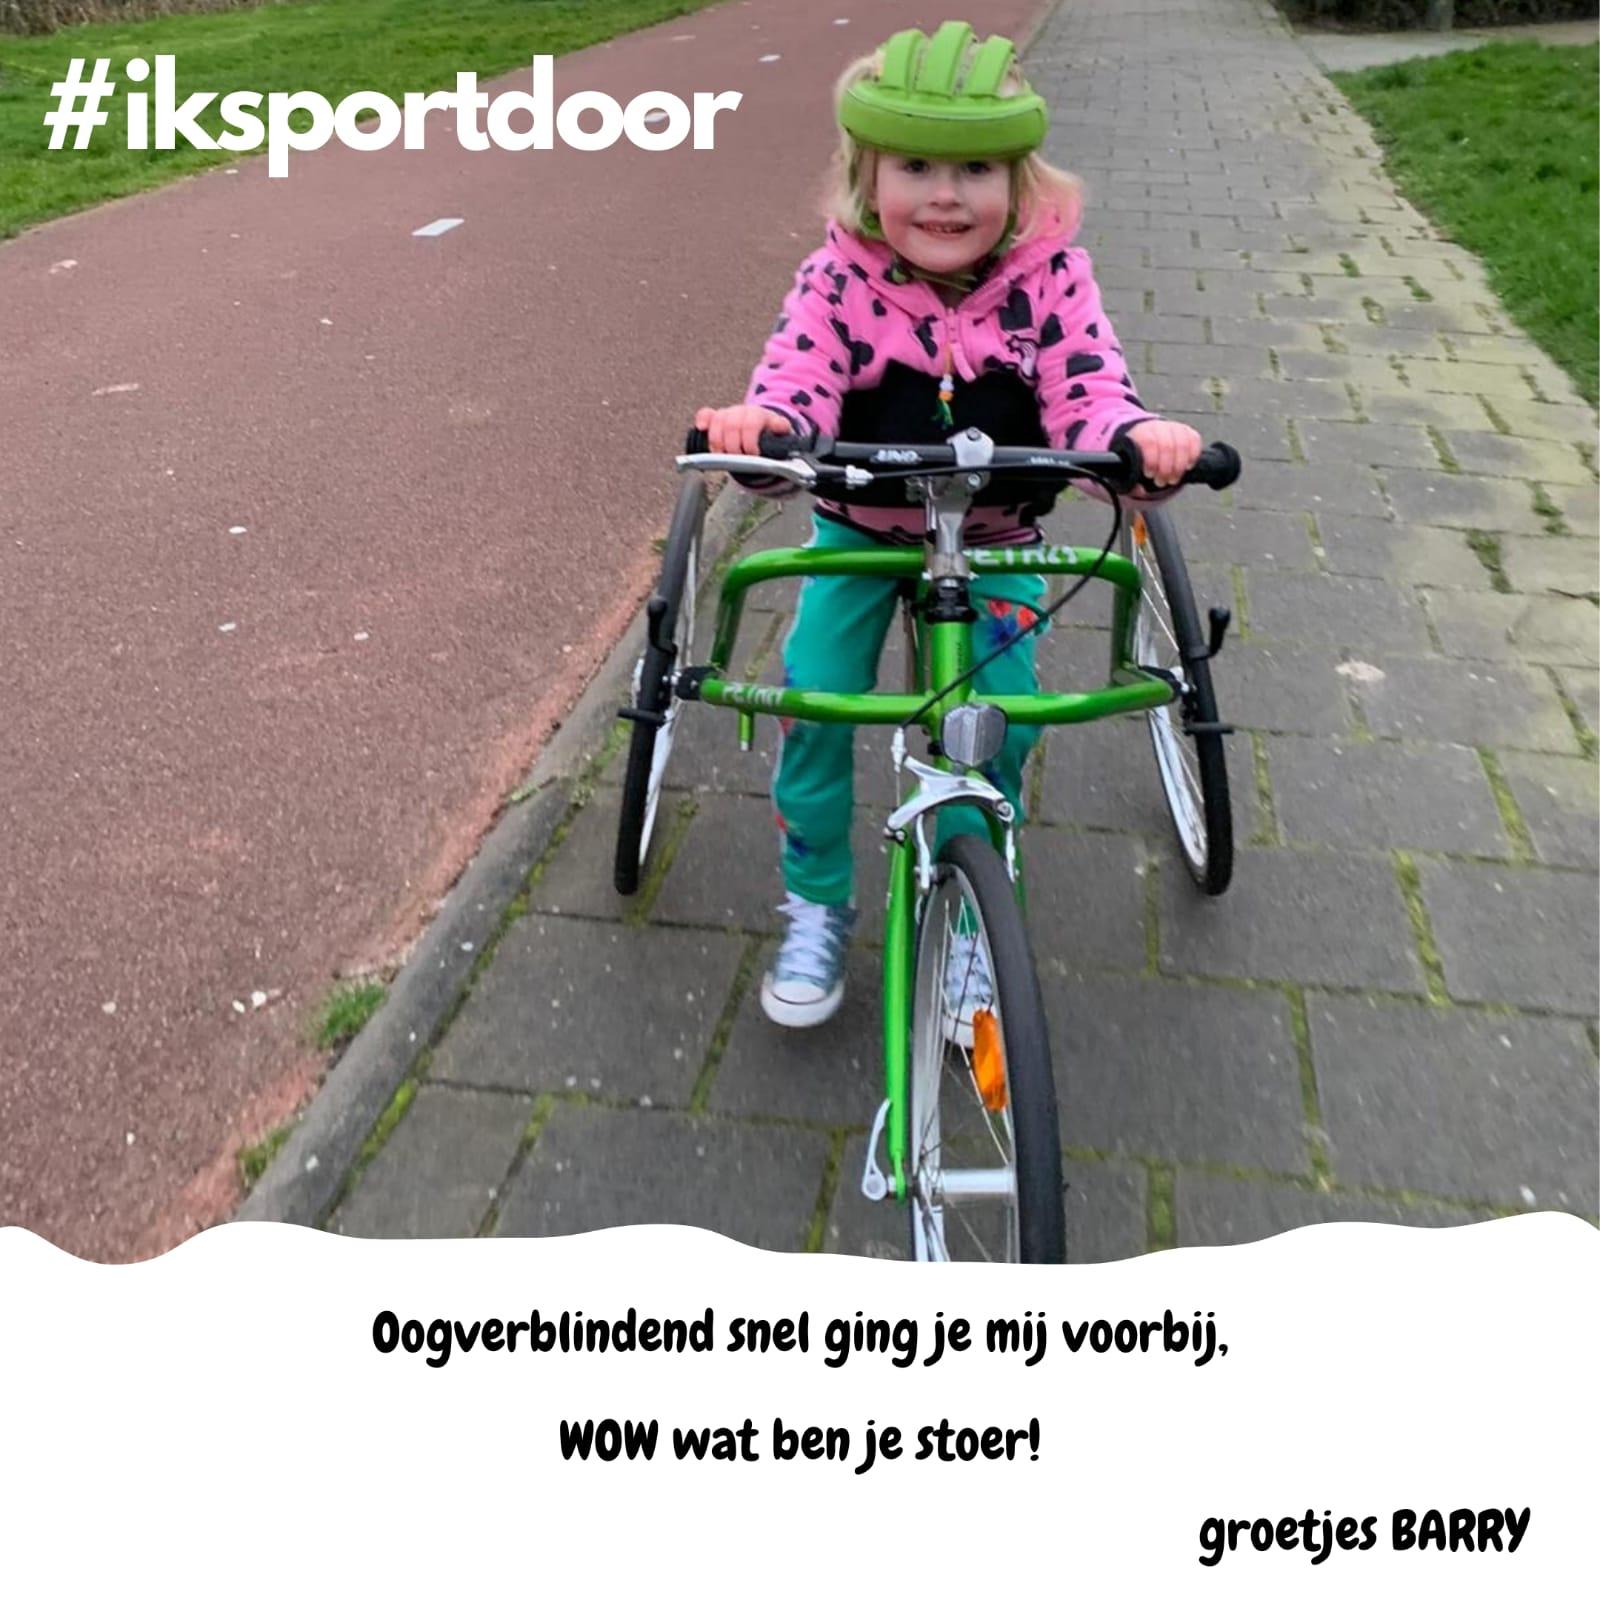 #iksportdoor